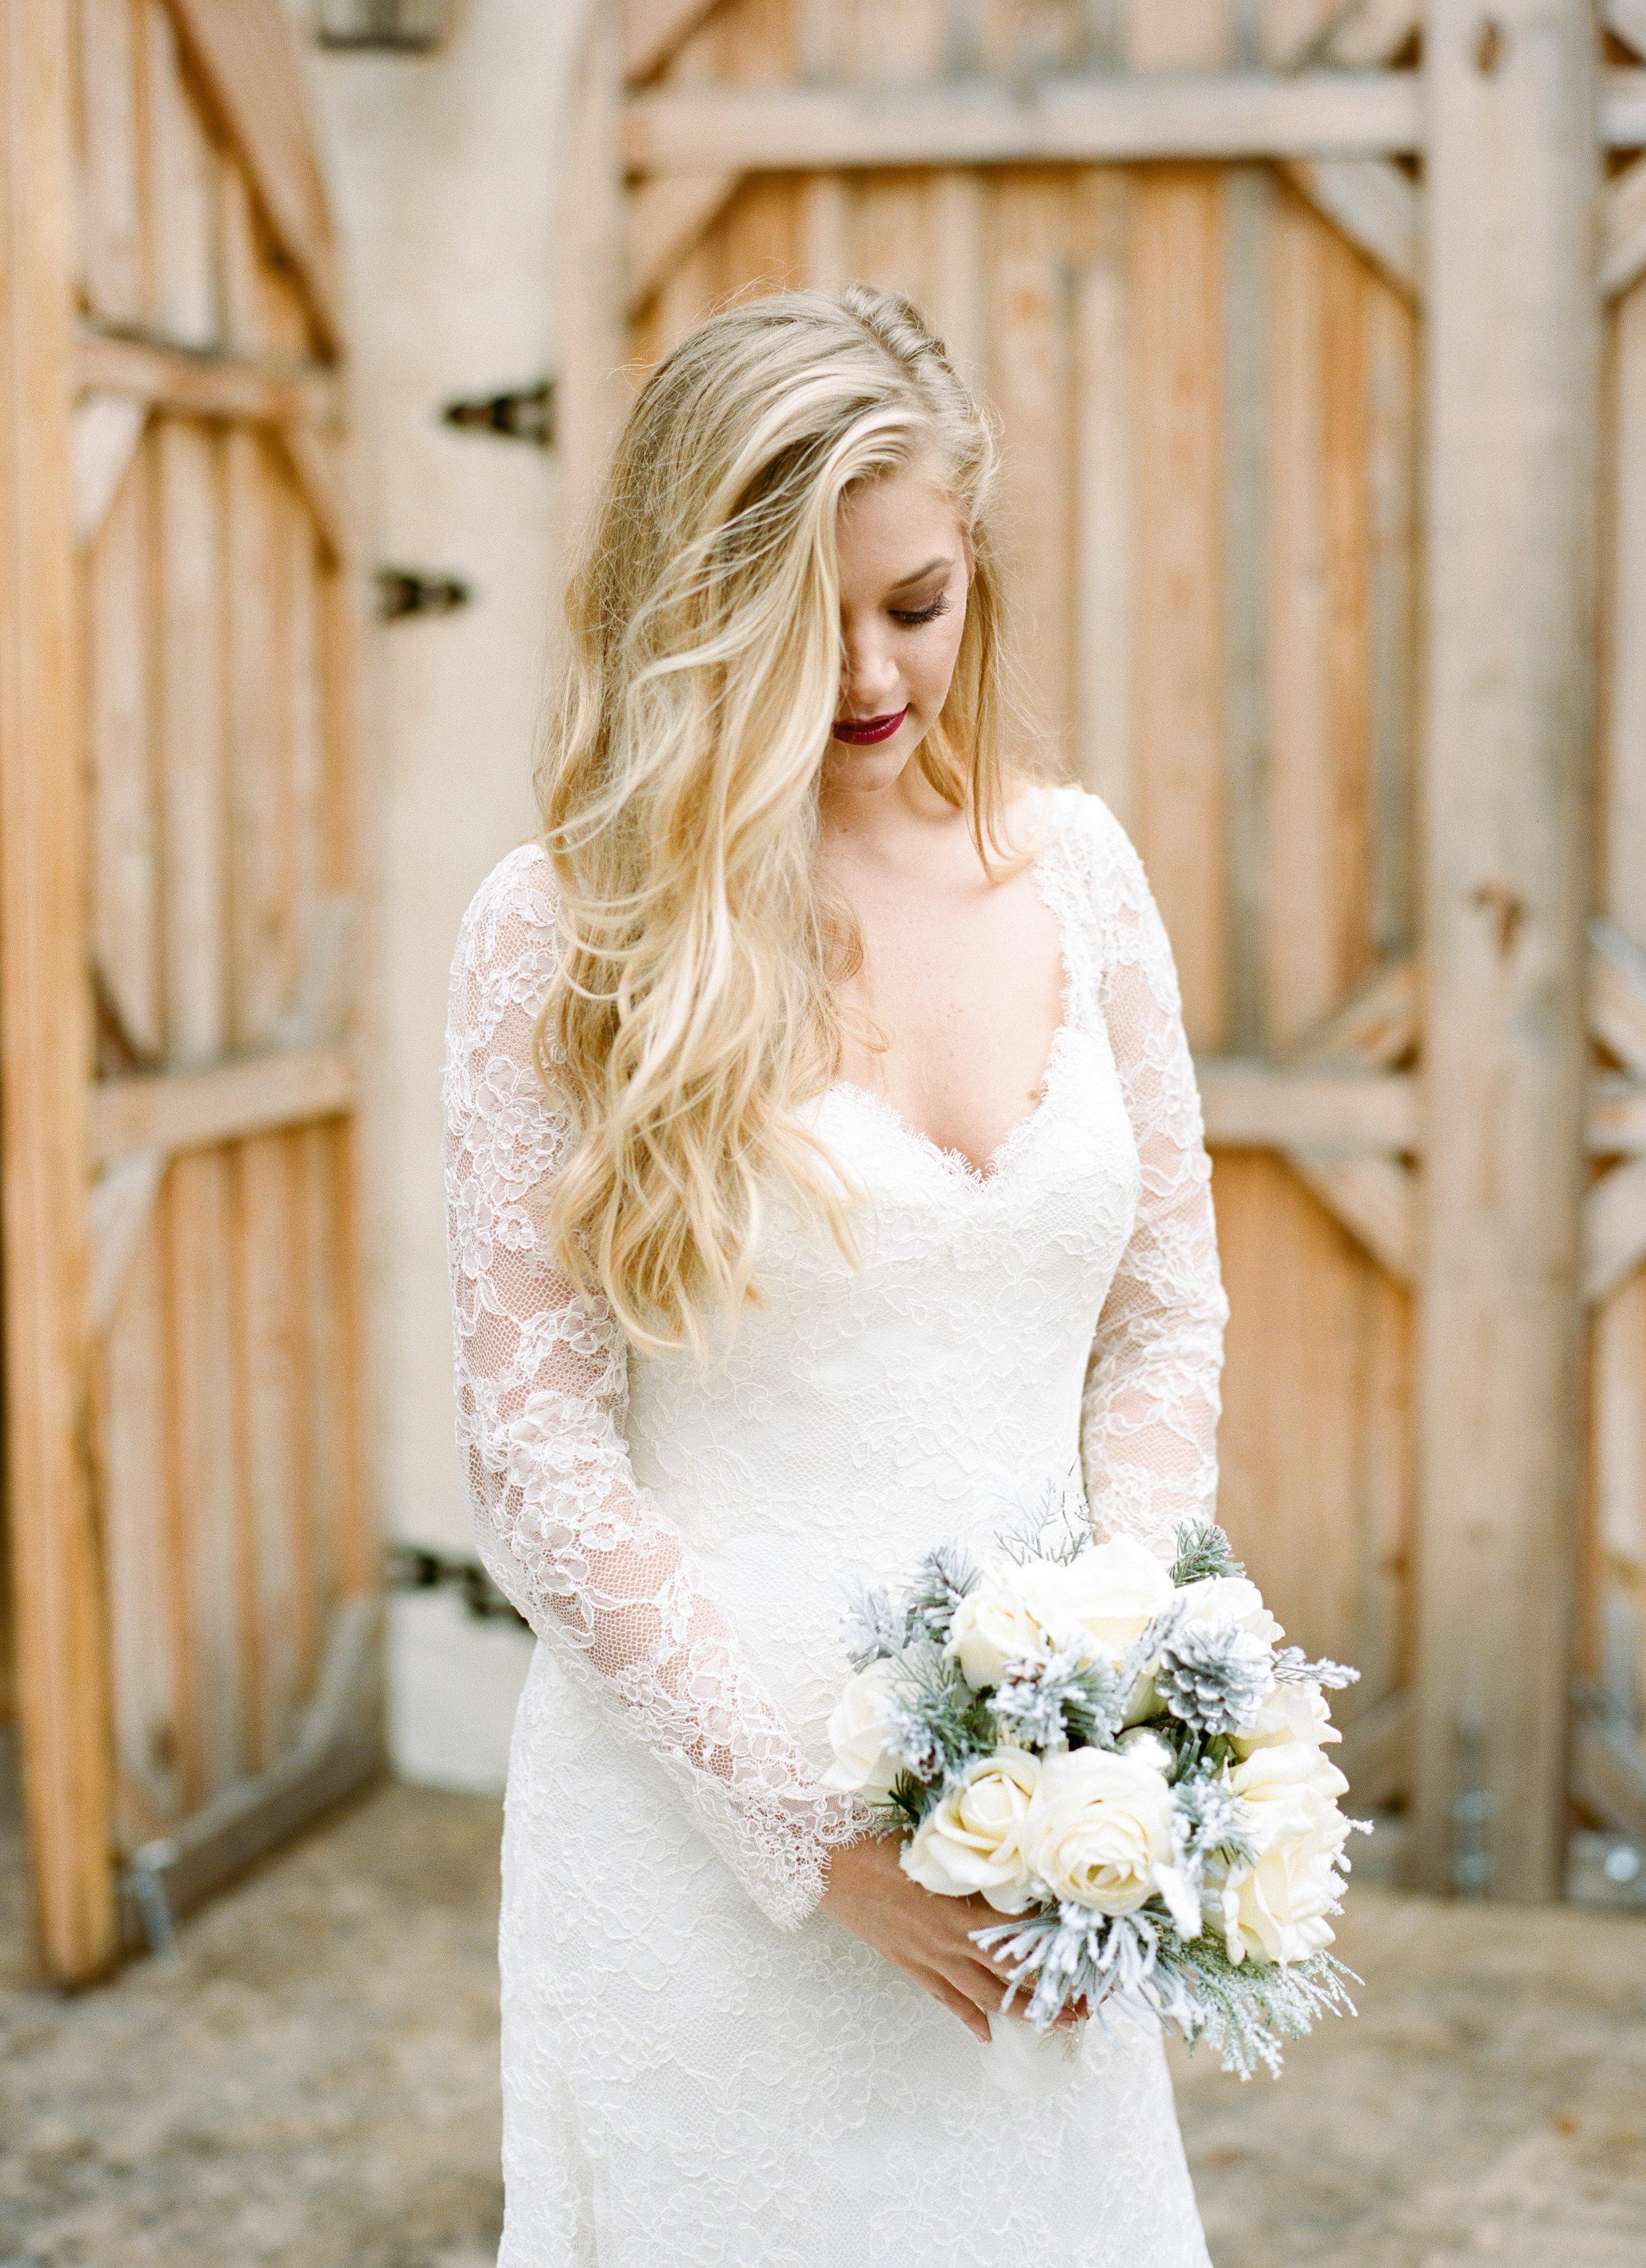 Hamby Wedding-Portraits-0005.jpg